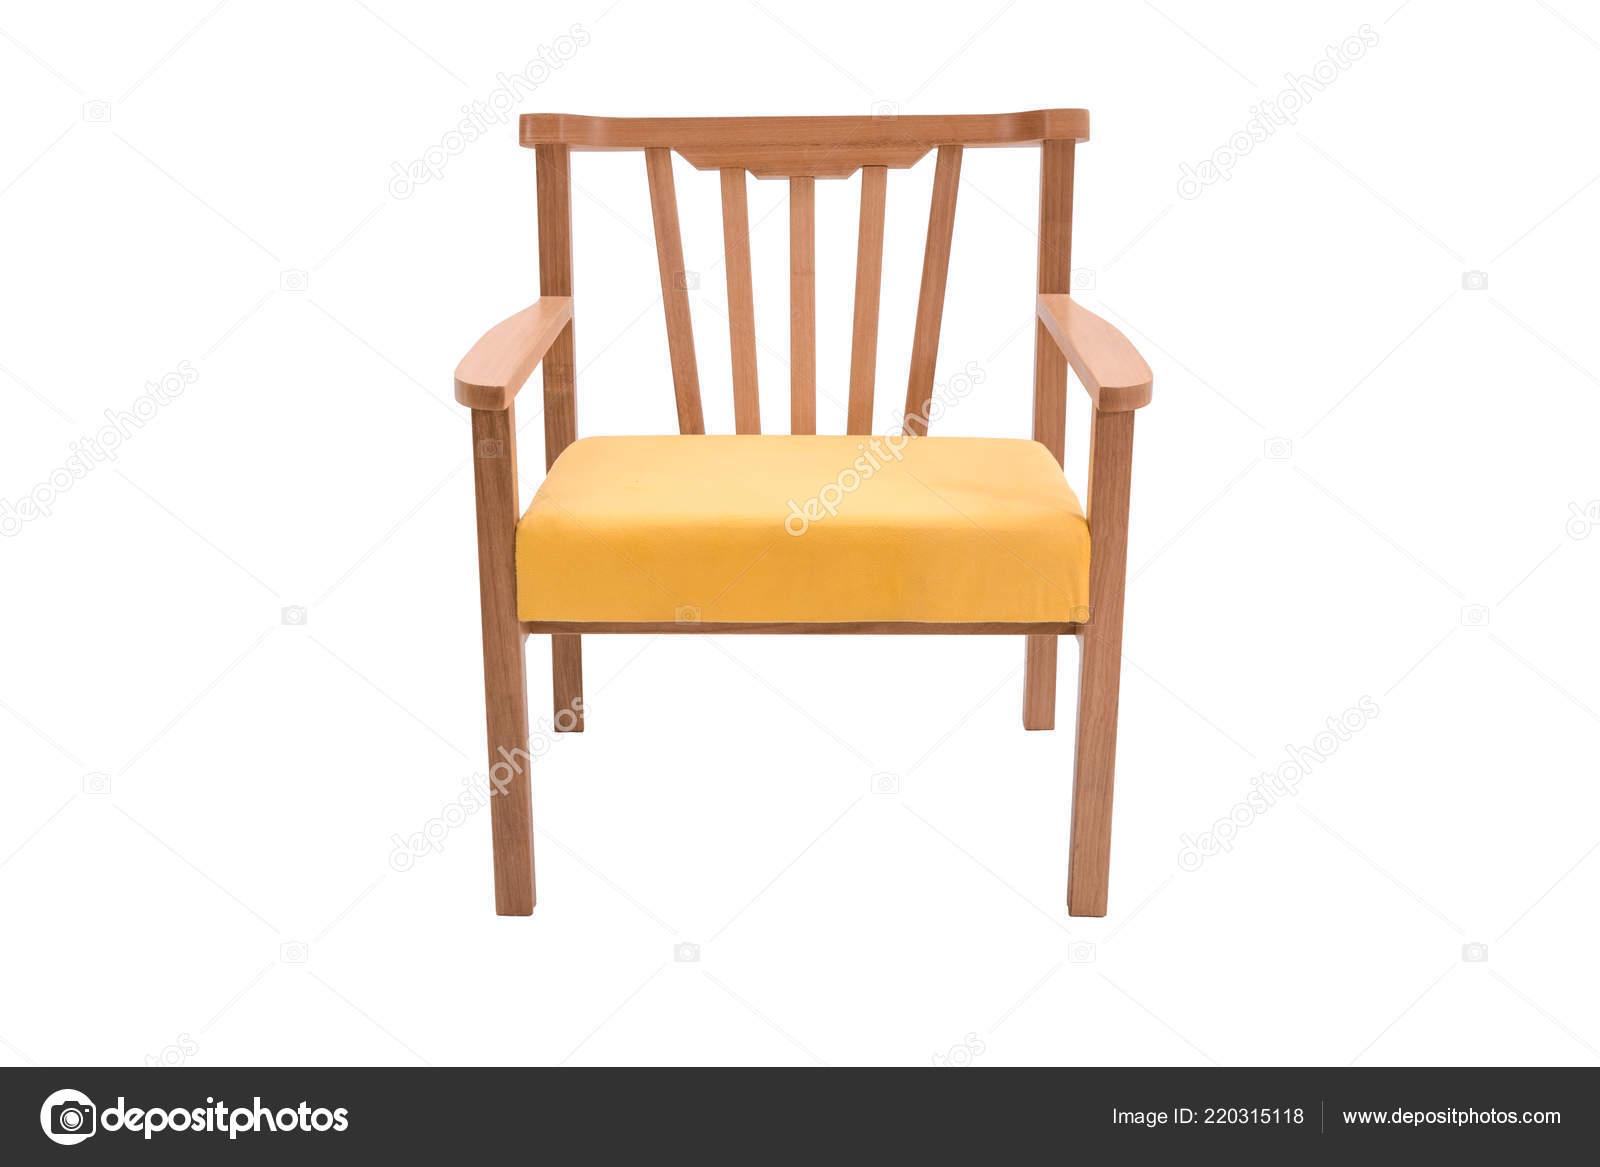 Fauteuil moderne design stoel witte achtergrond textuur stoel